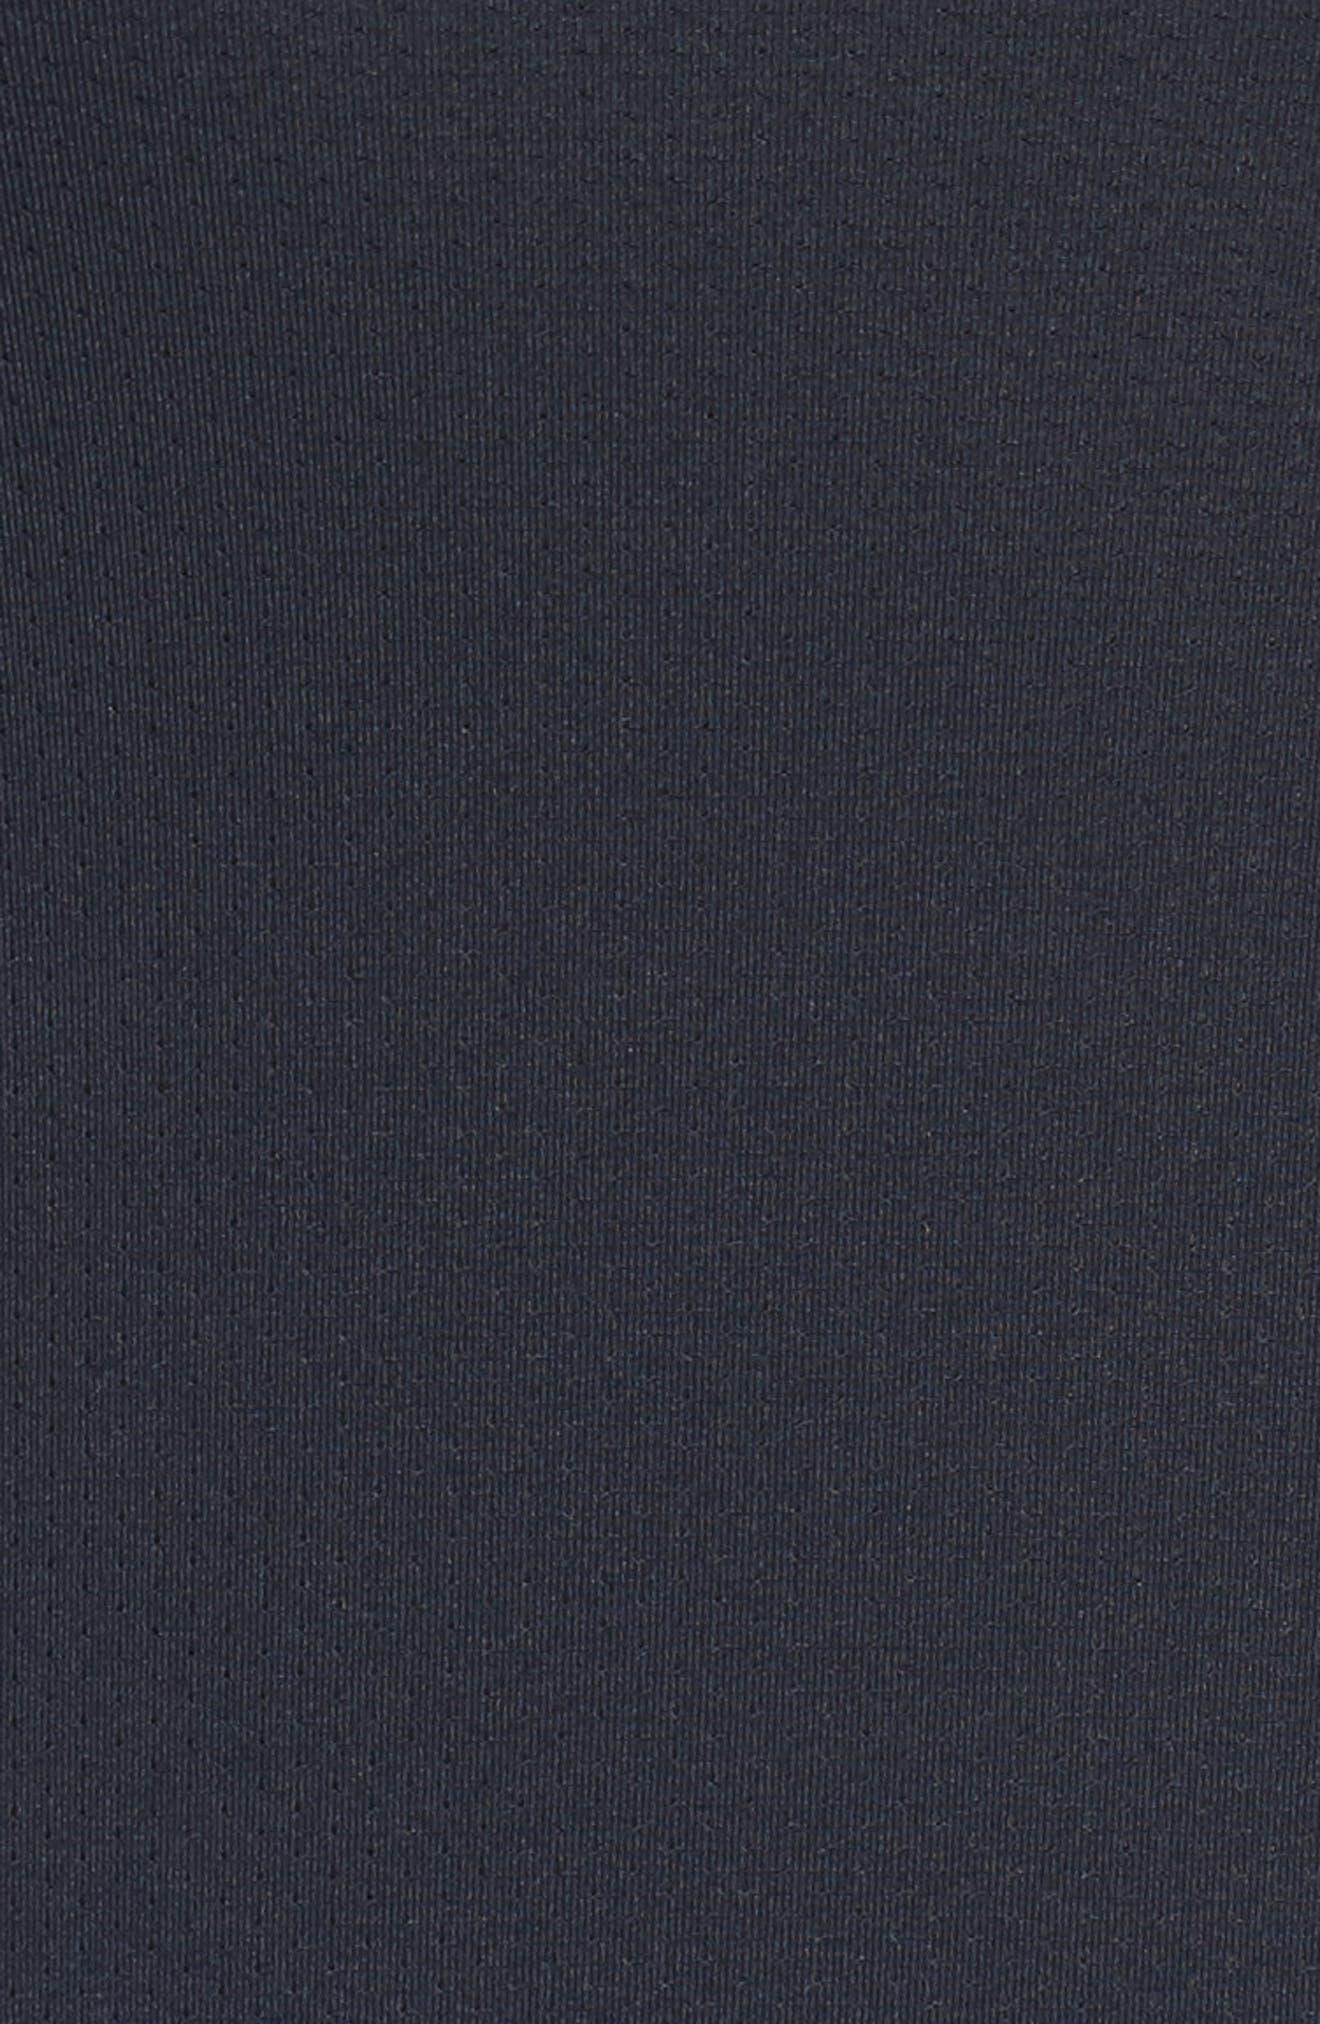 Training Pullover,                             Alternate thumbnail 7, color,                             Dark Obsidian/ Royal/ Yellow